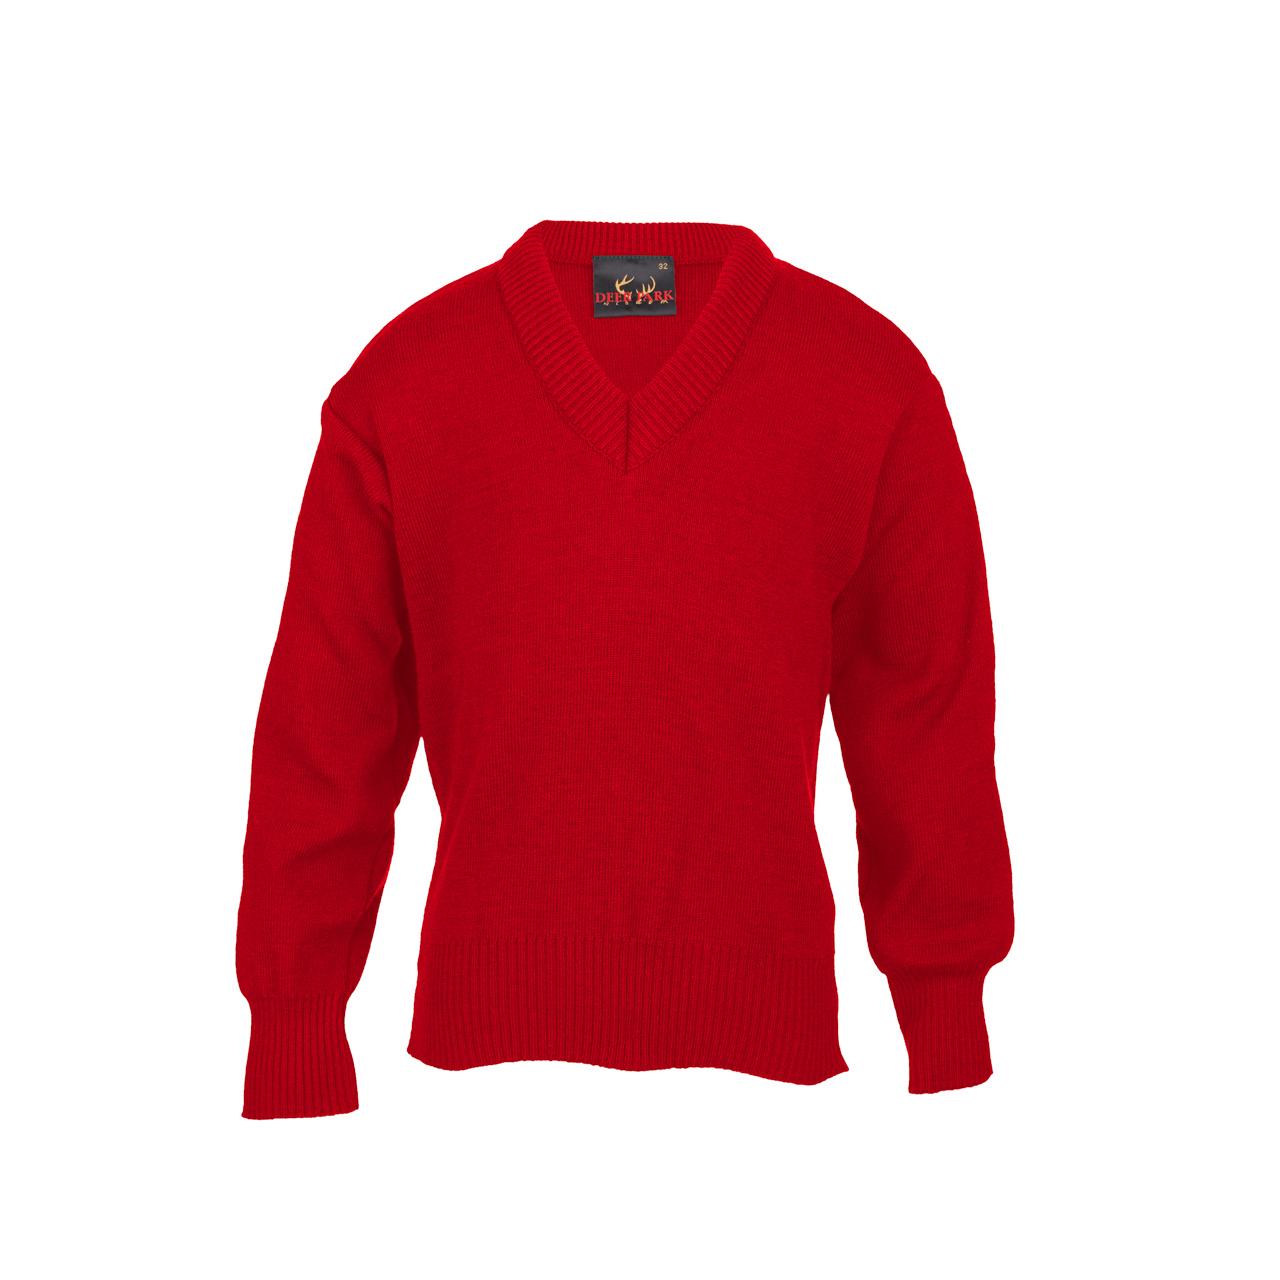 Gaelscoil Na Ndeise School Uniforms